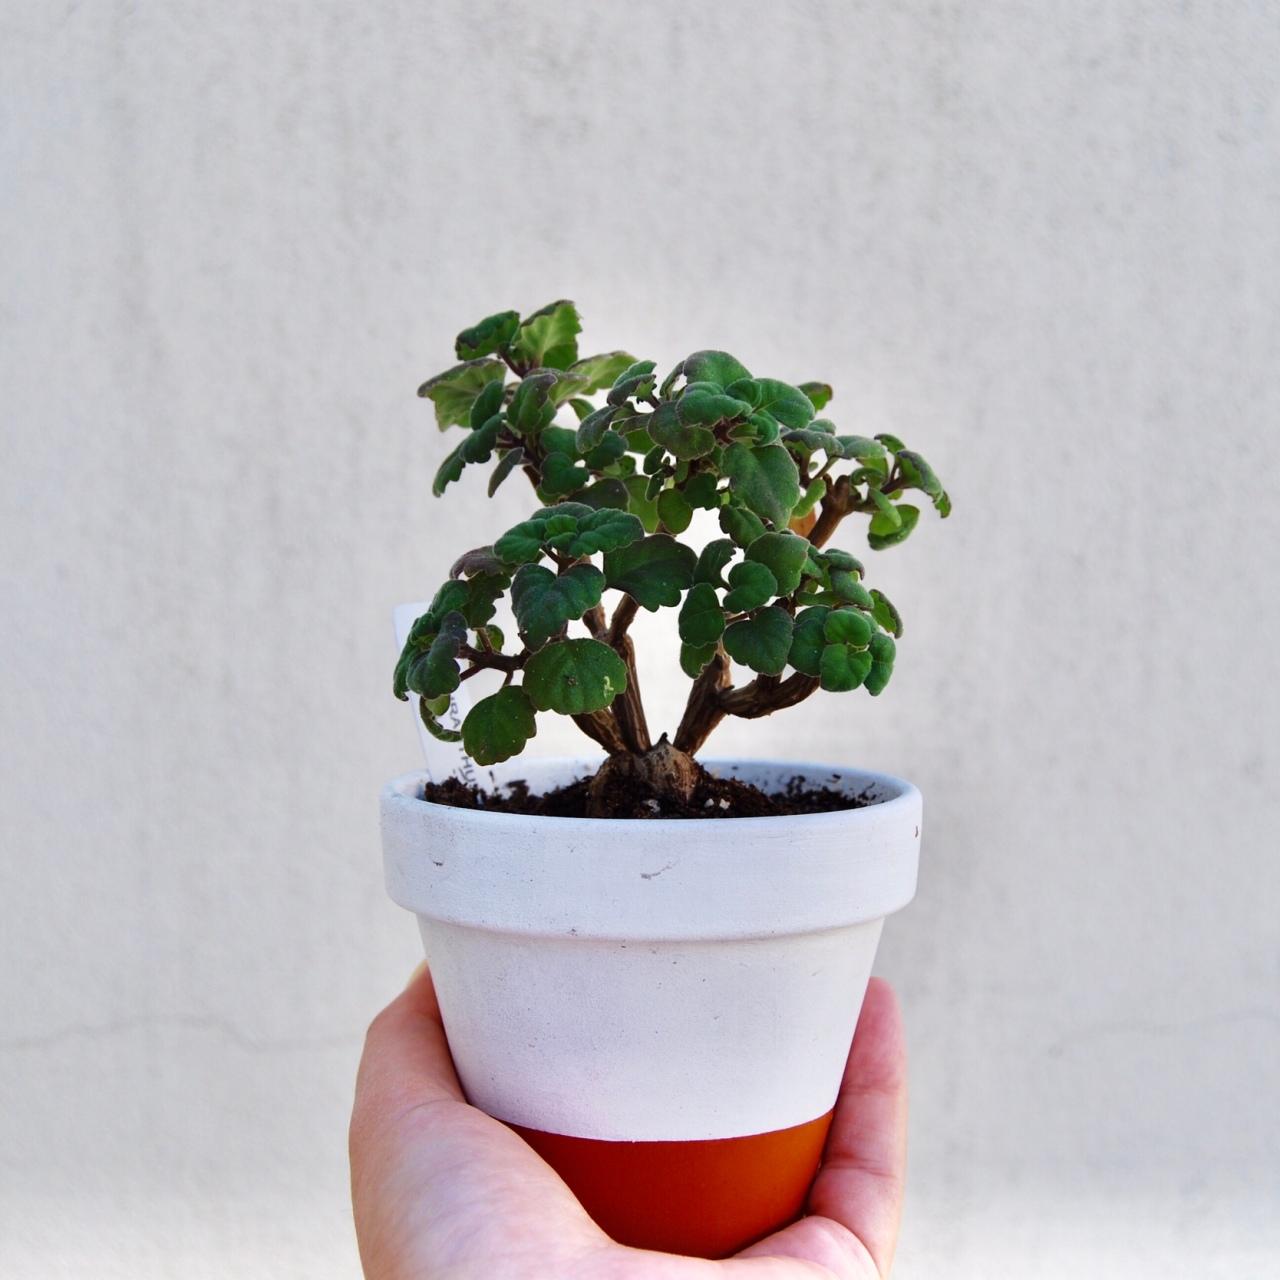 """Plectranthus Ernstii (プレクトランサス・エルンスティー)"""